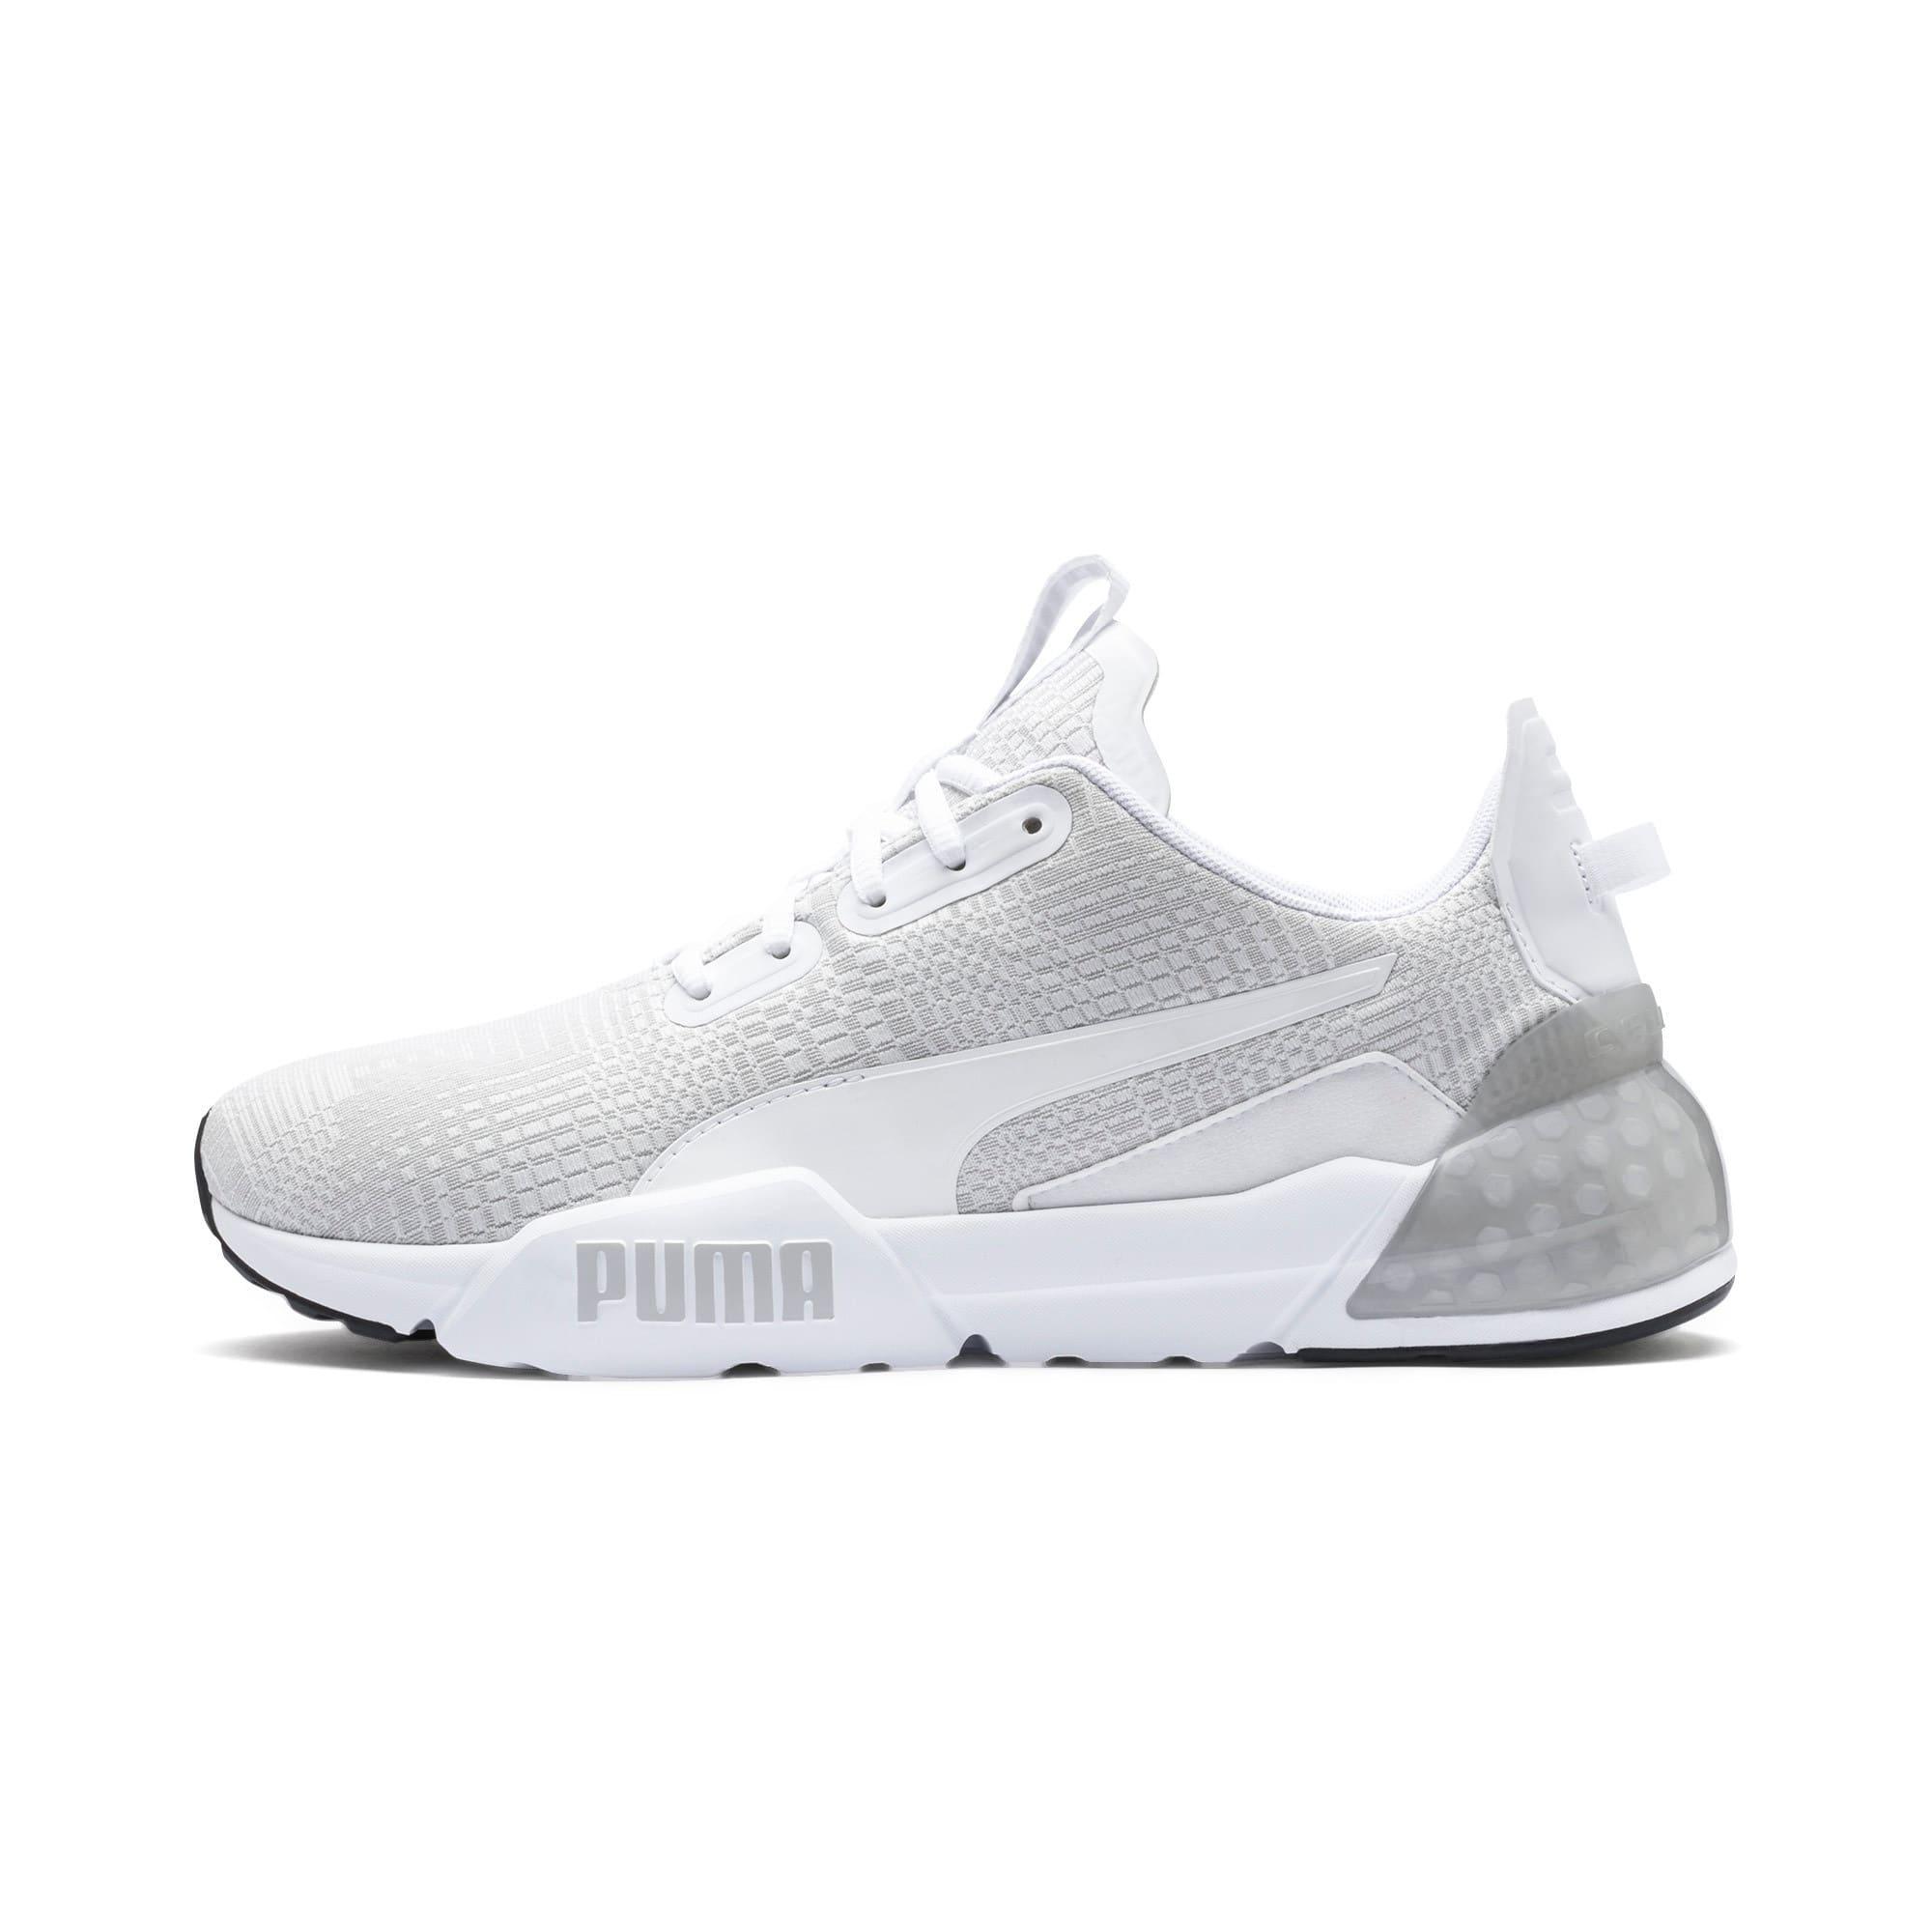 Thumbnail 1 of CELL Phase Lights Men's Running Shoes, Puma White-Gray Violet, medium